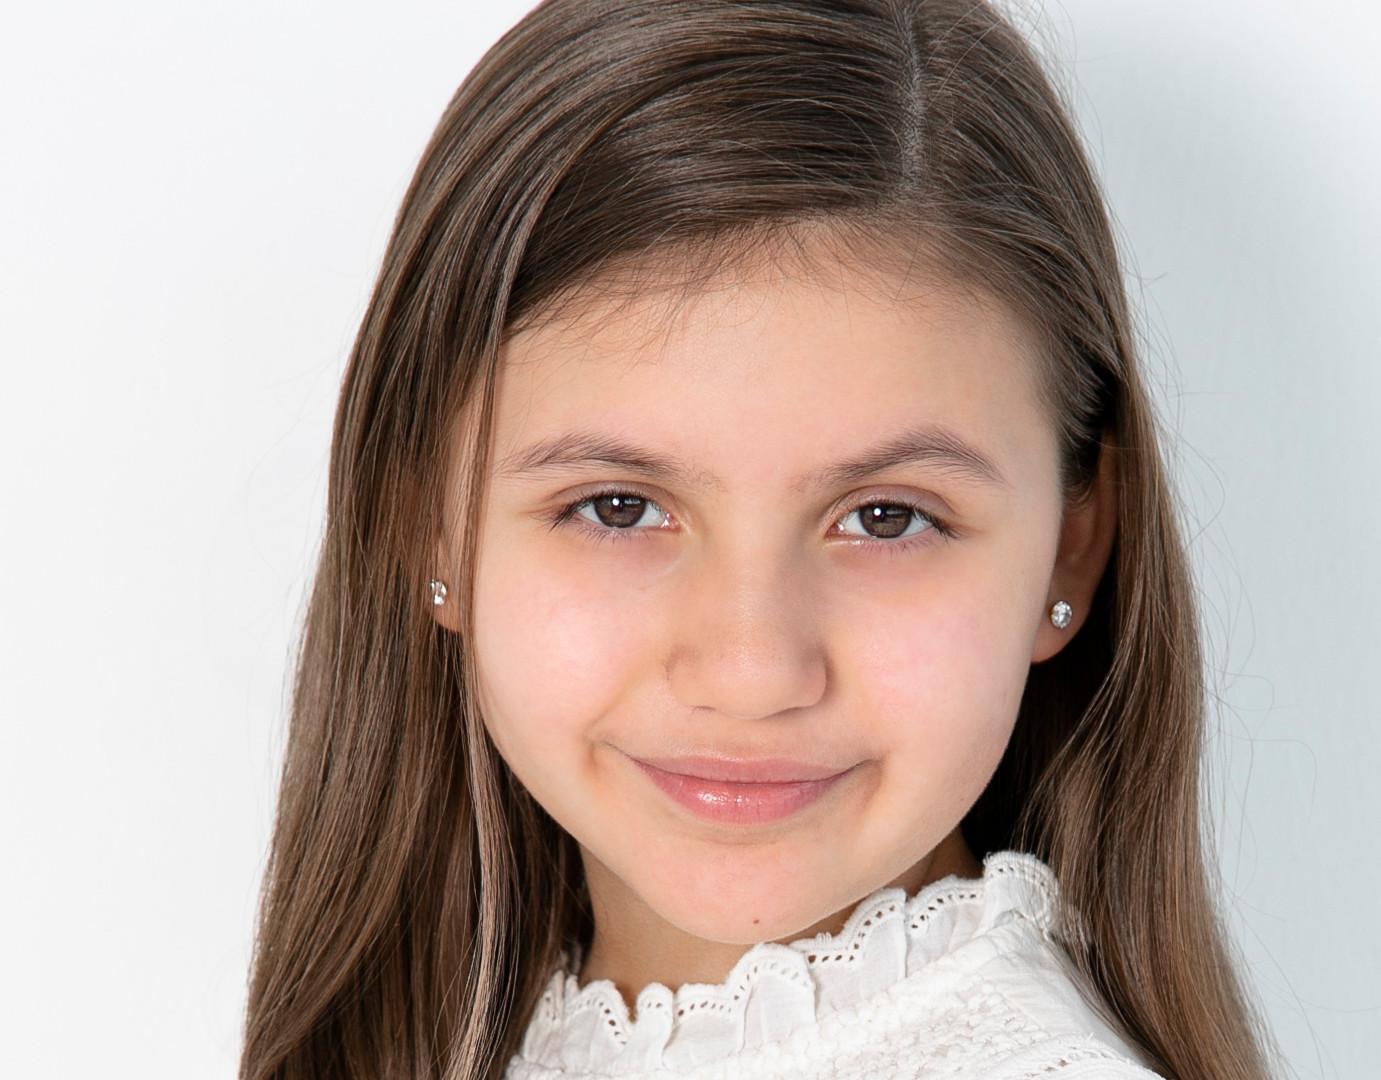 Actress Headshot.jpg